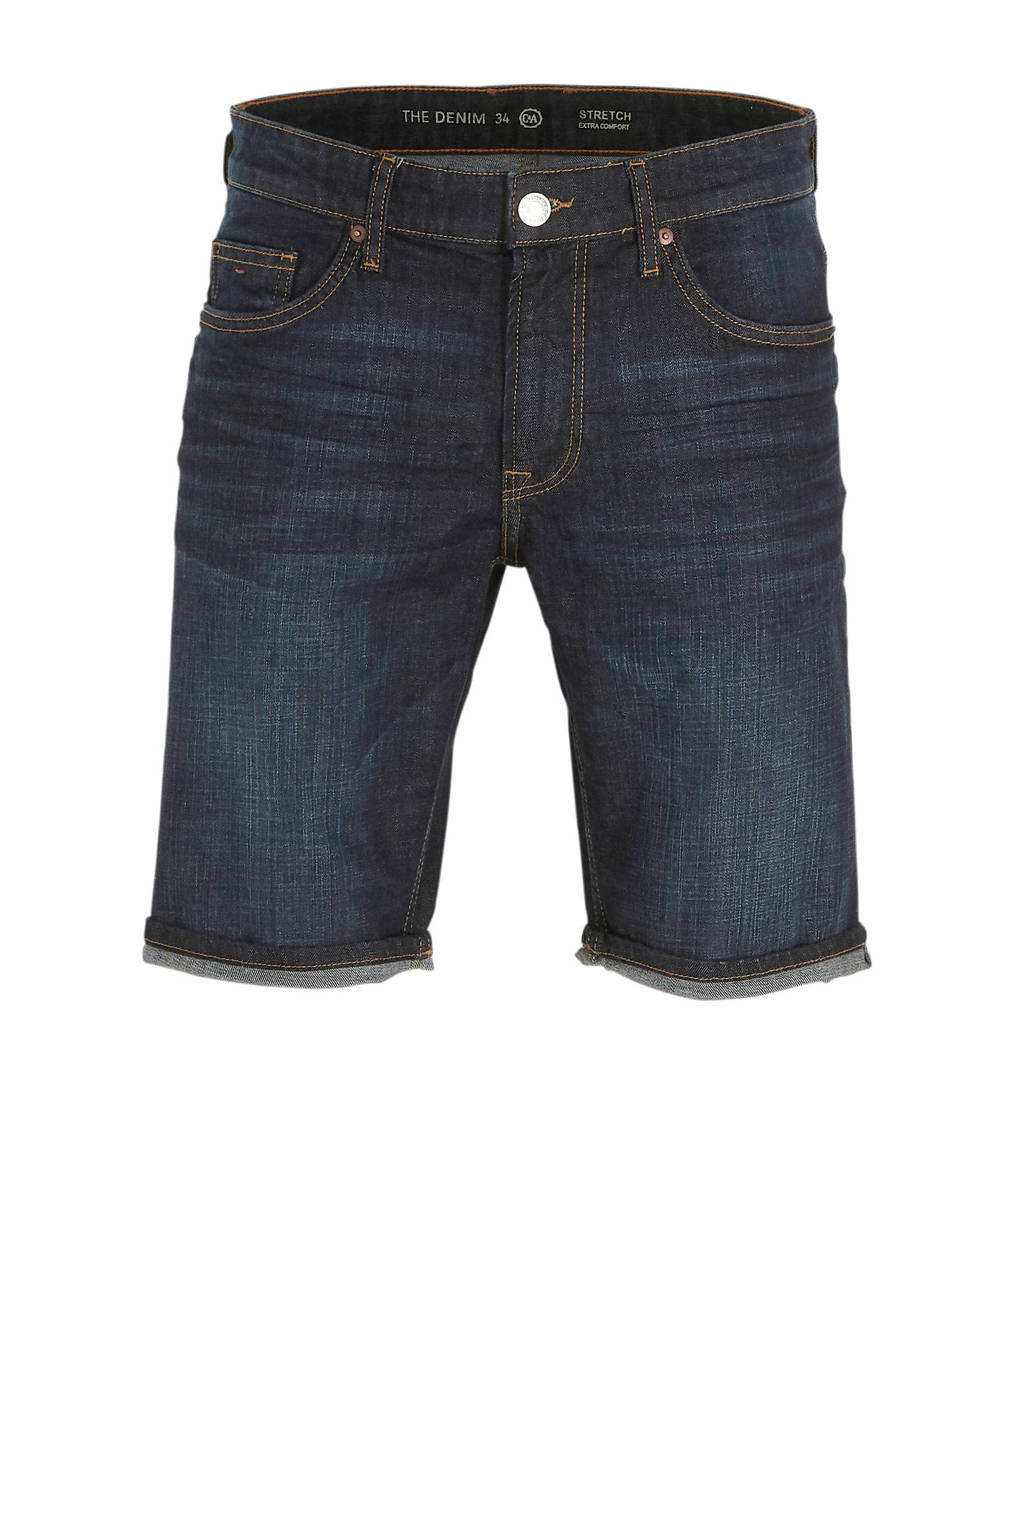 C&A The Denim slim fit jeans short donkerblauw, Donkerblauw